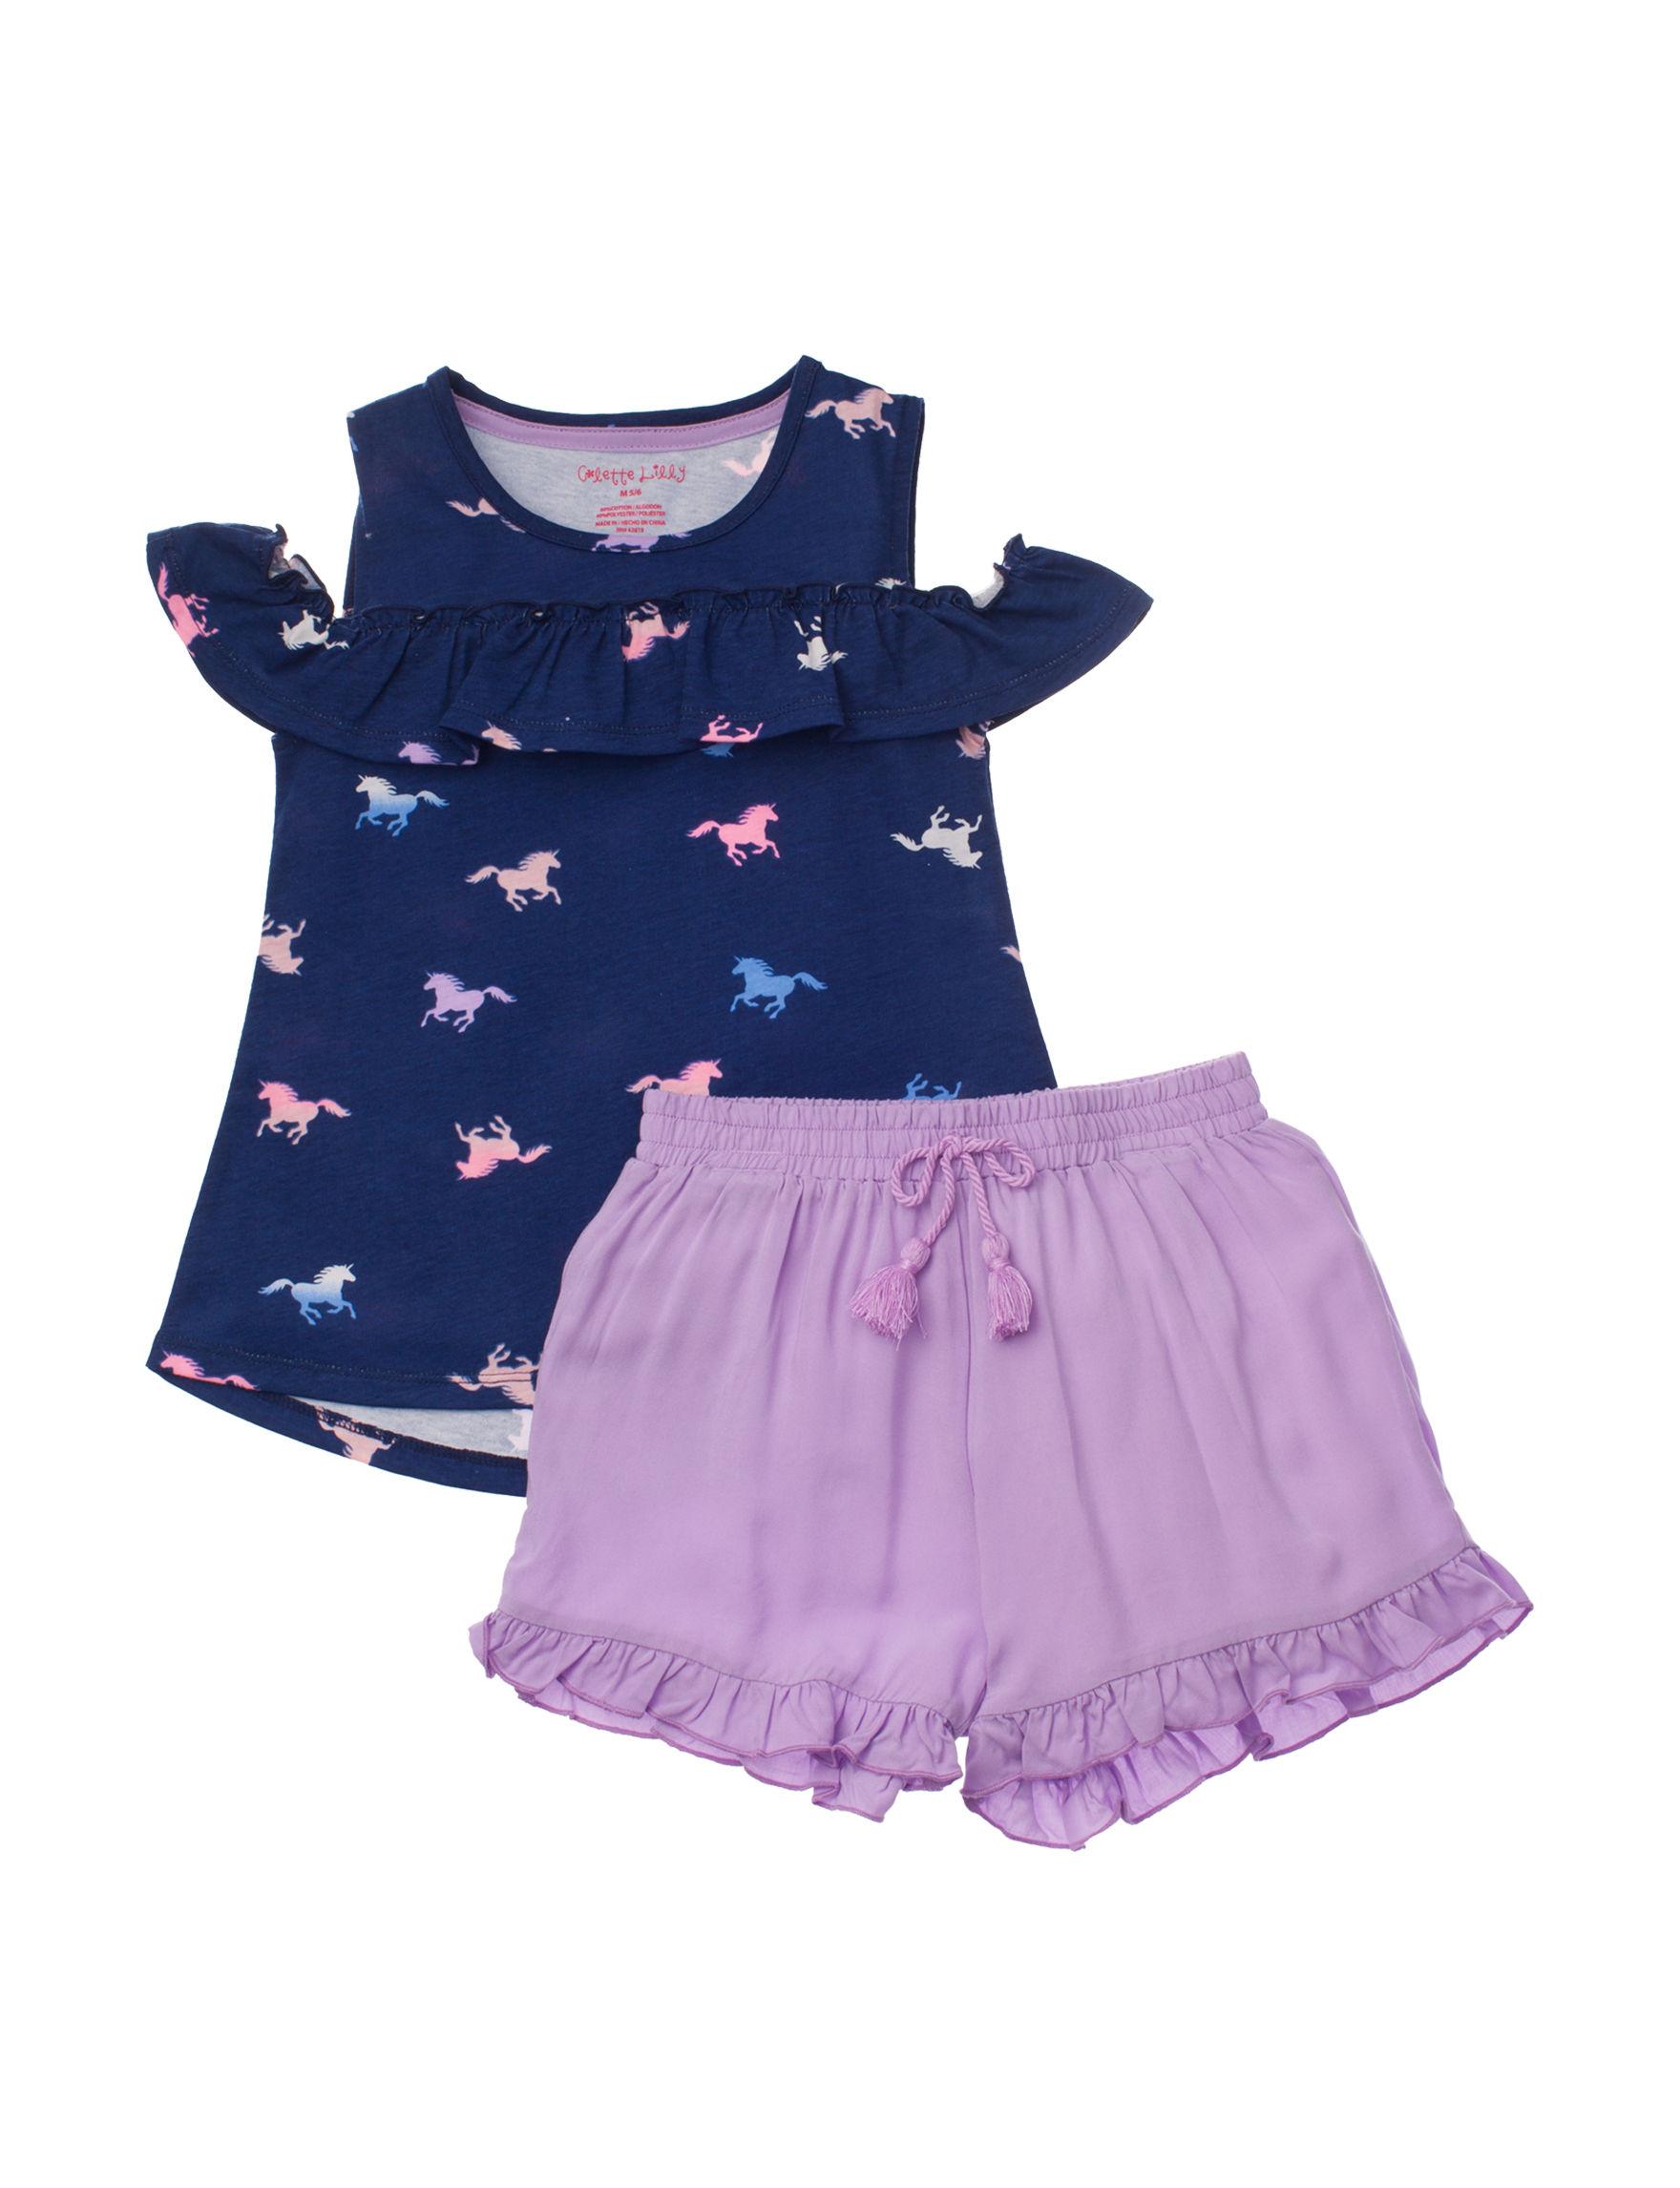 Colette Lily Navy / Purple